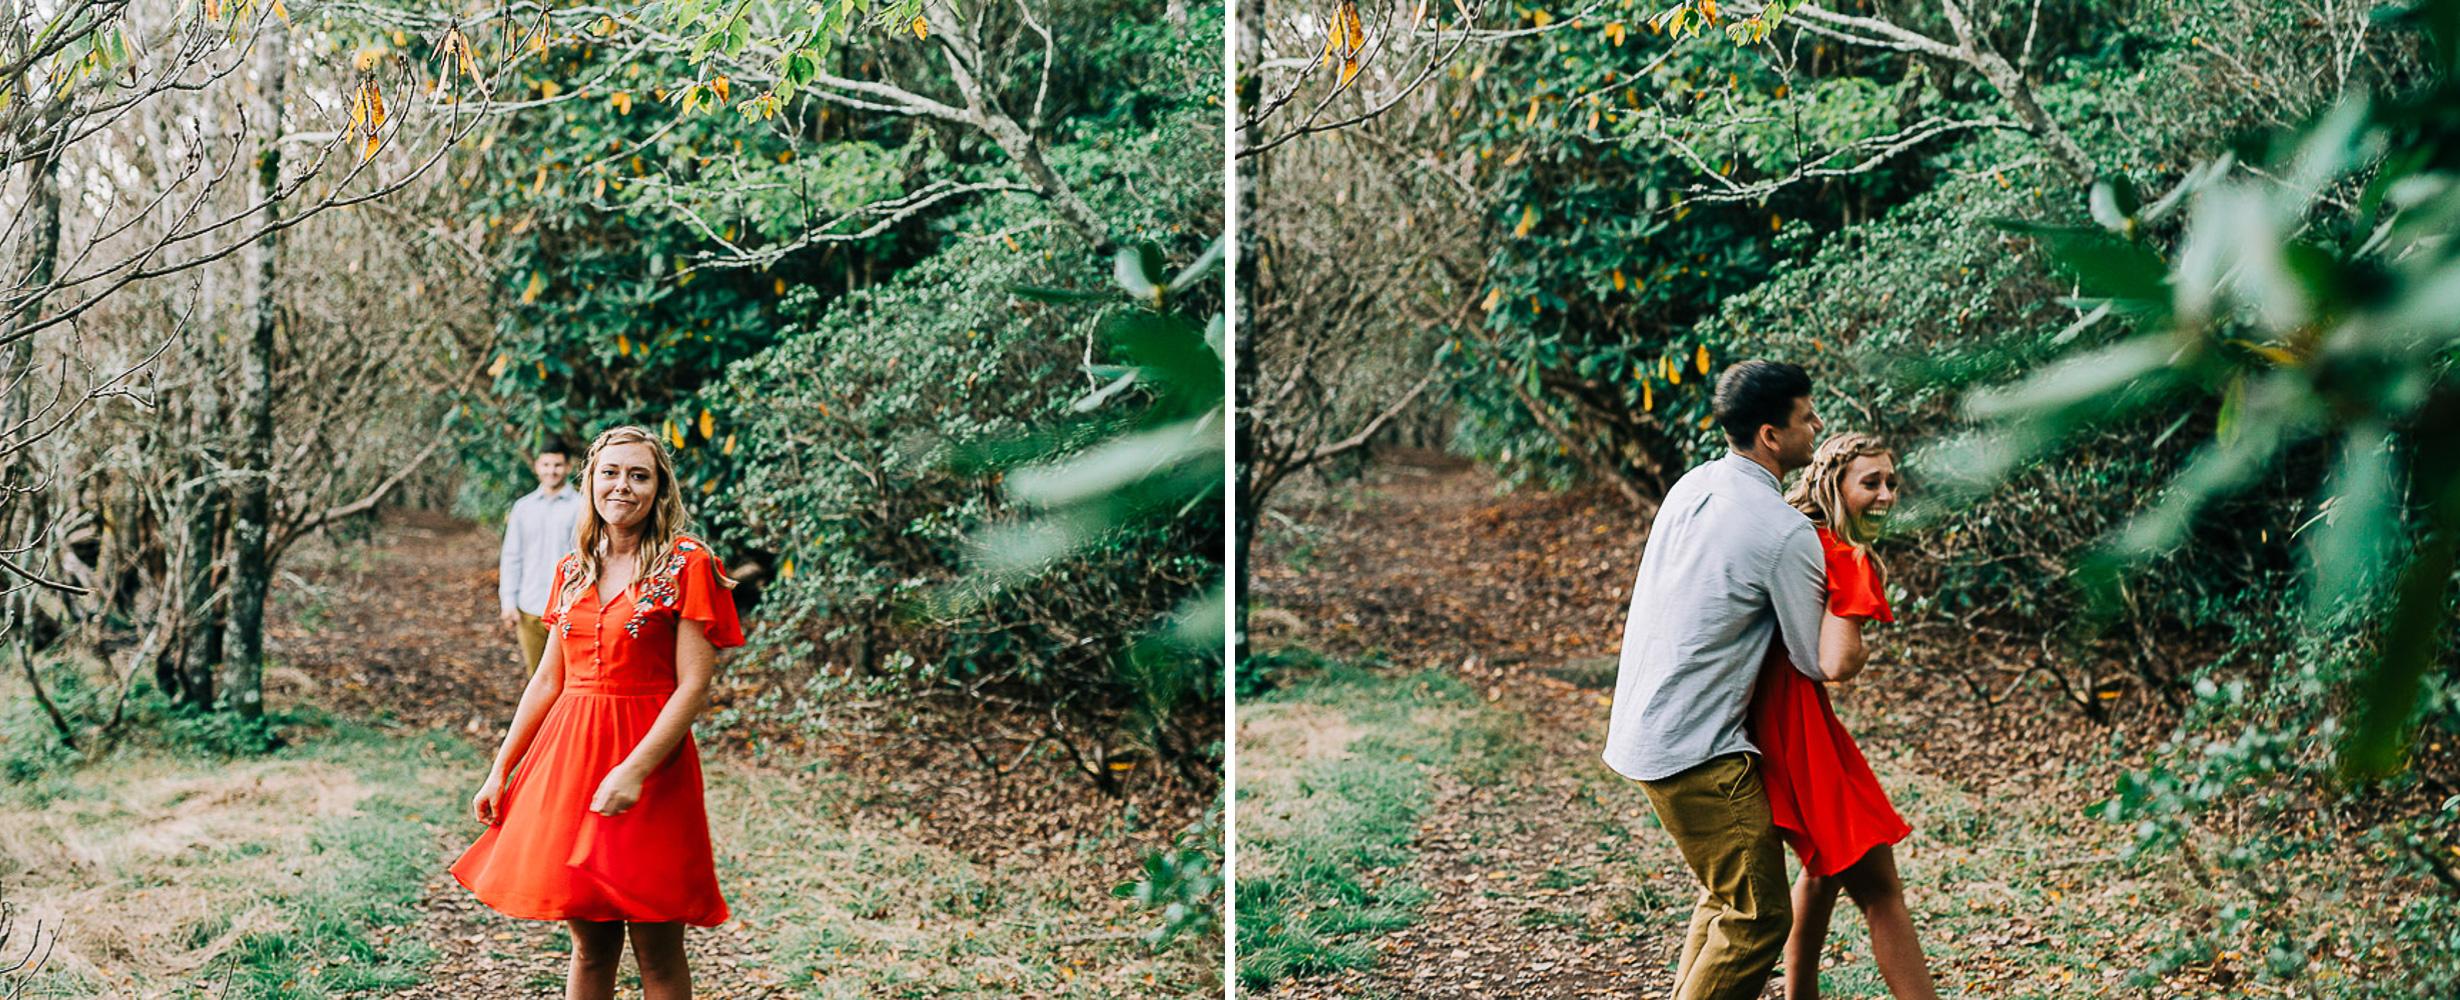 Engagement Portraits 21.jpg